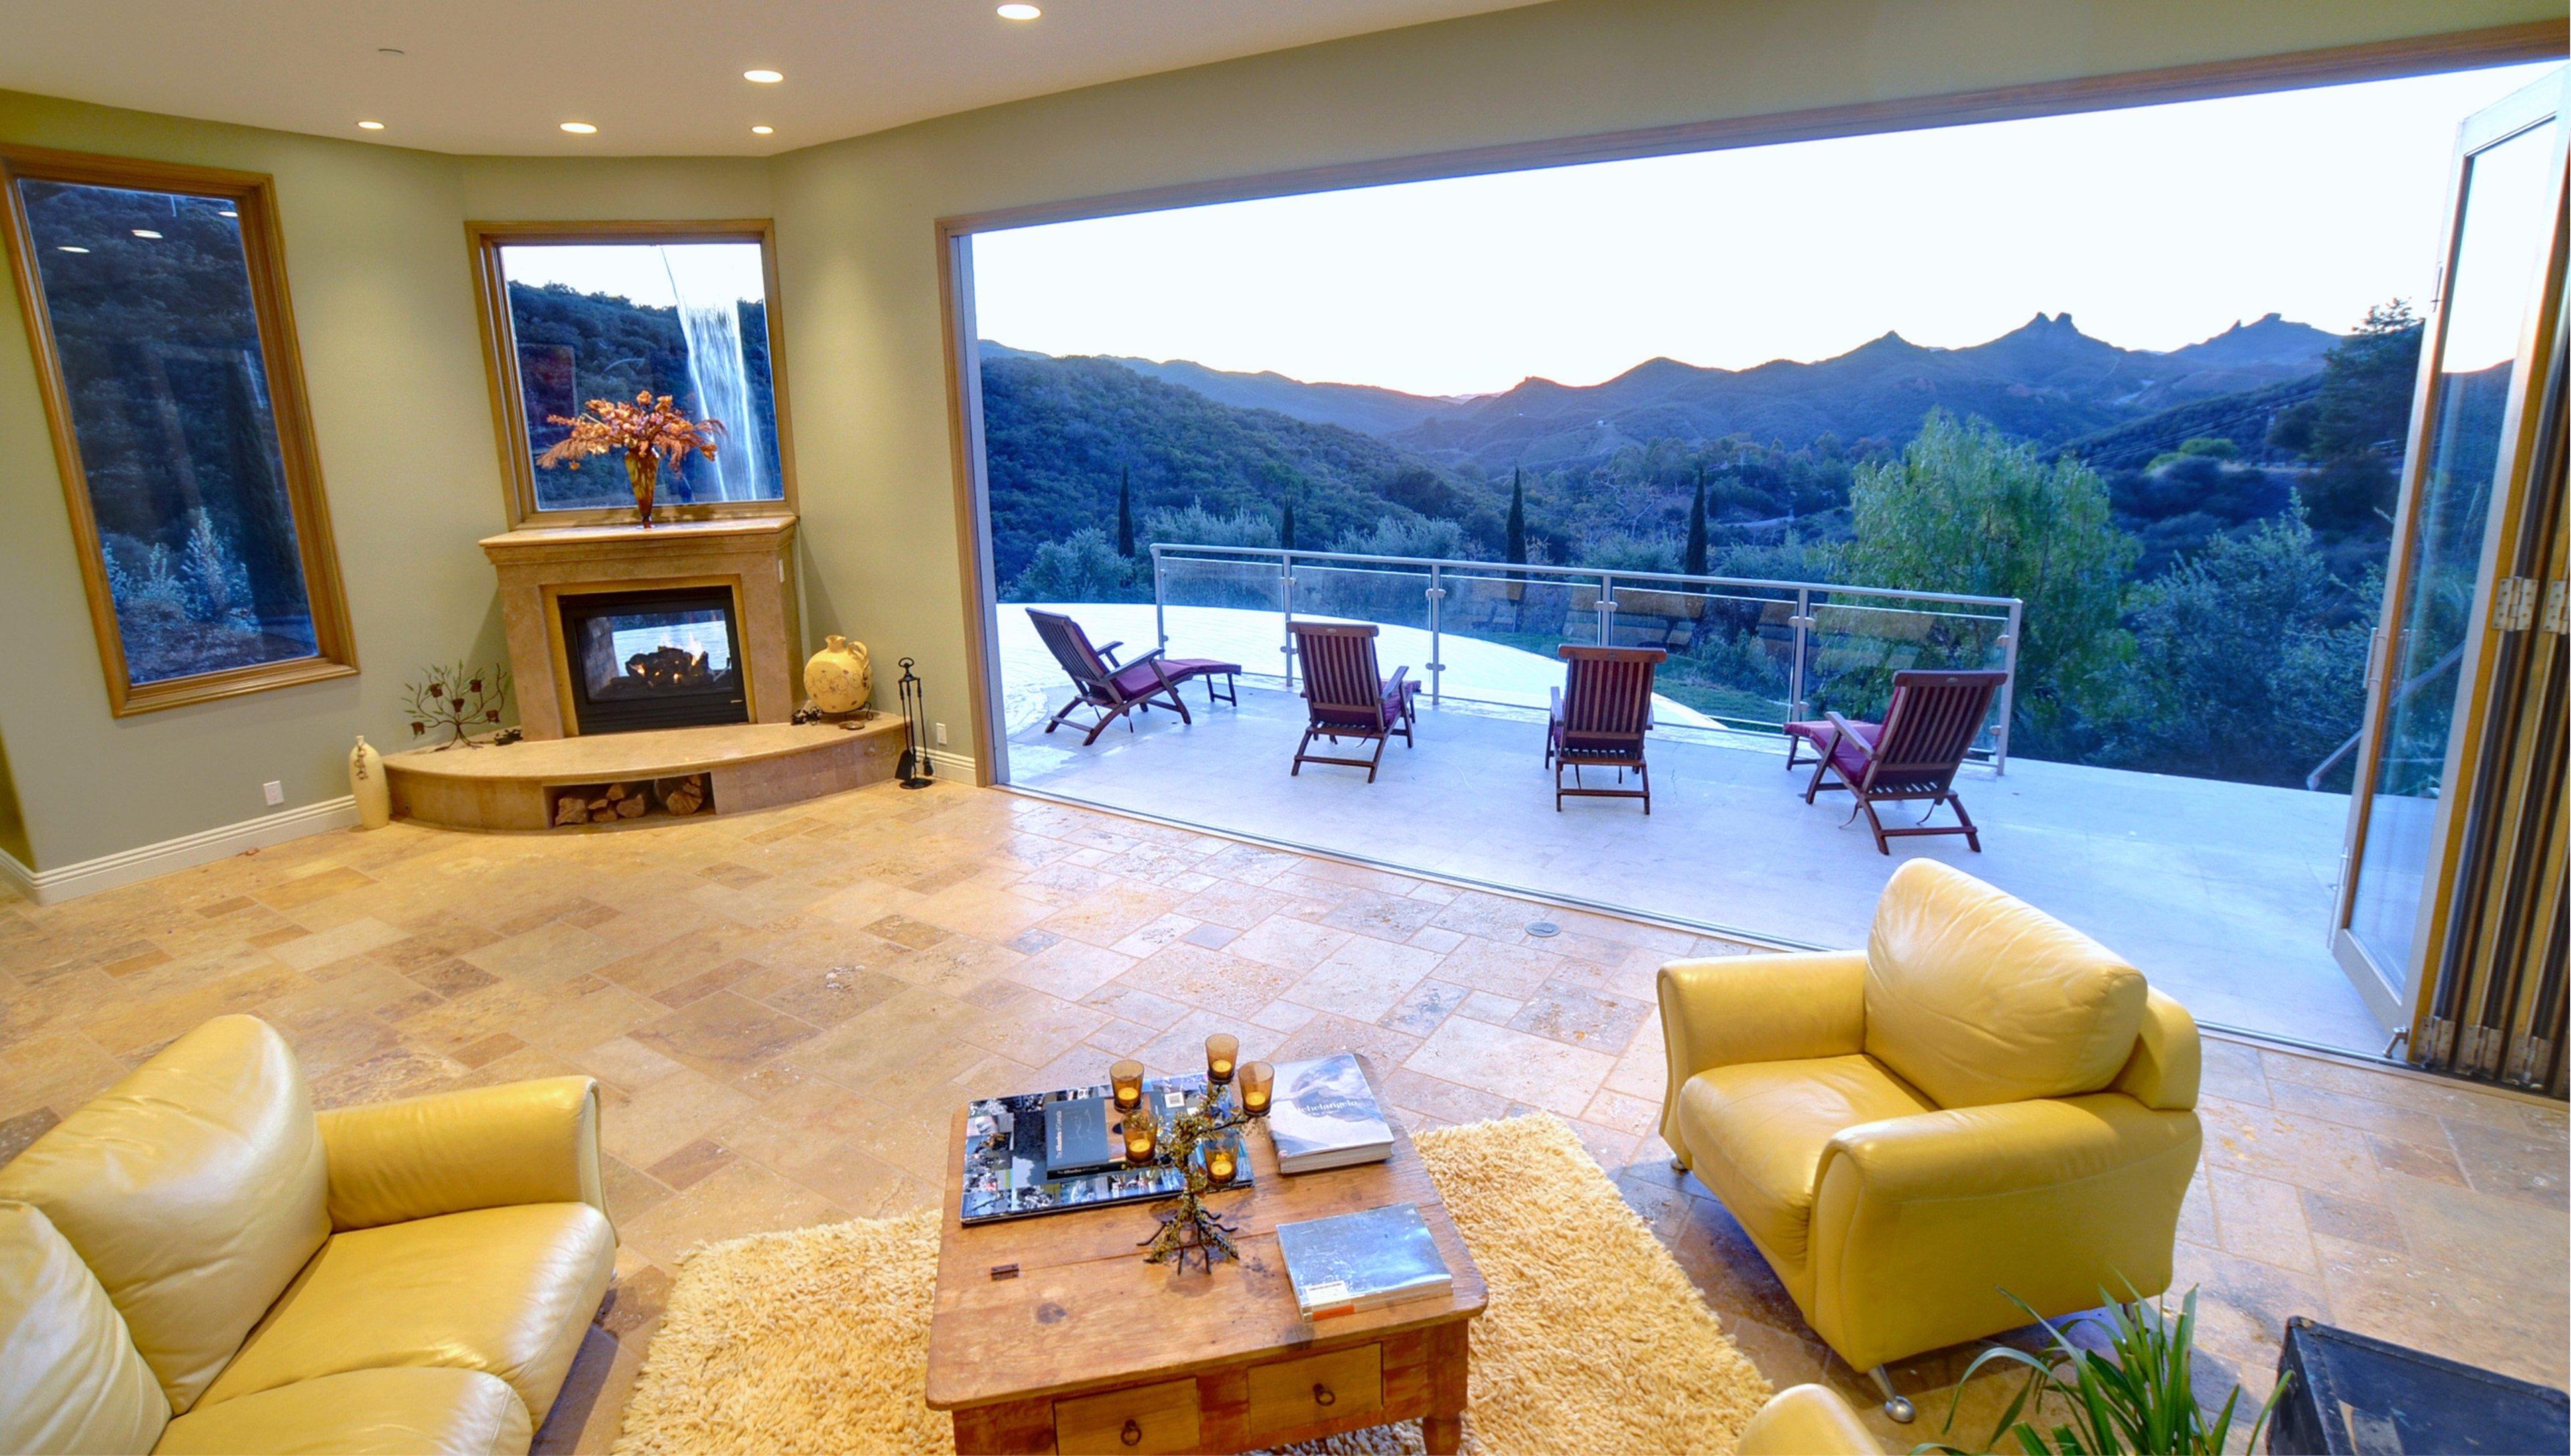 Interior design style landscape house Villa living-room ...